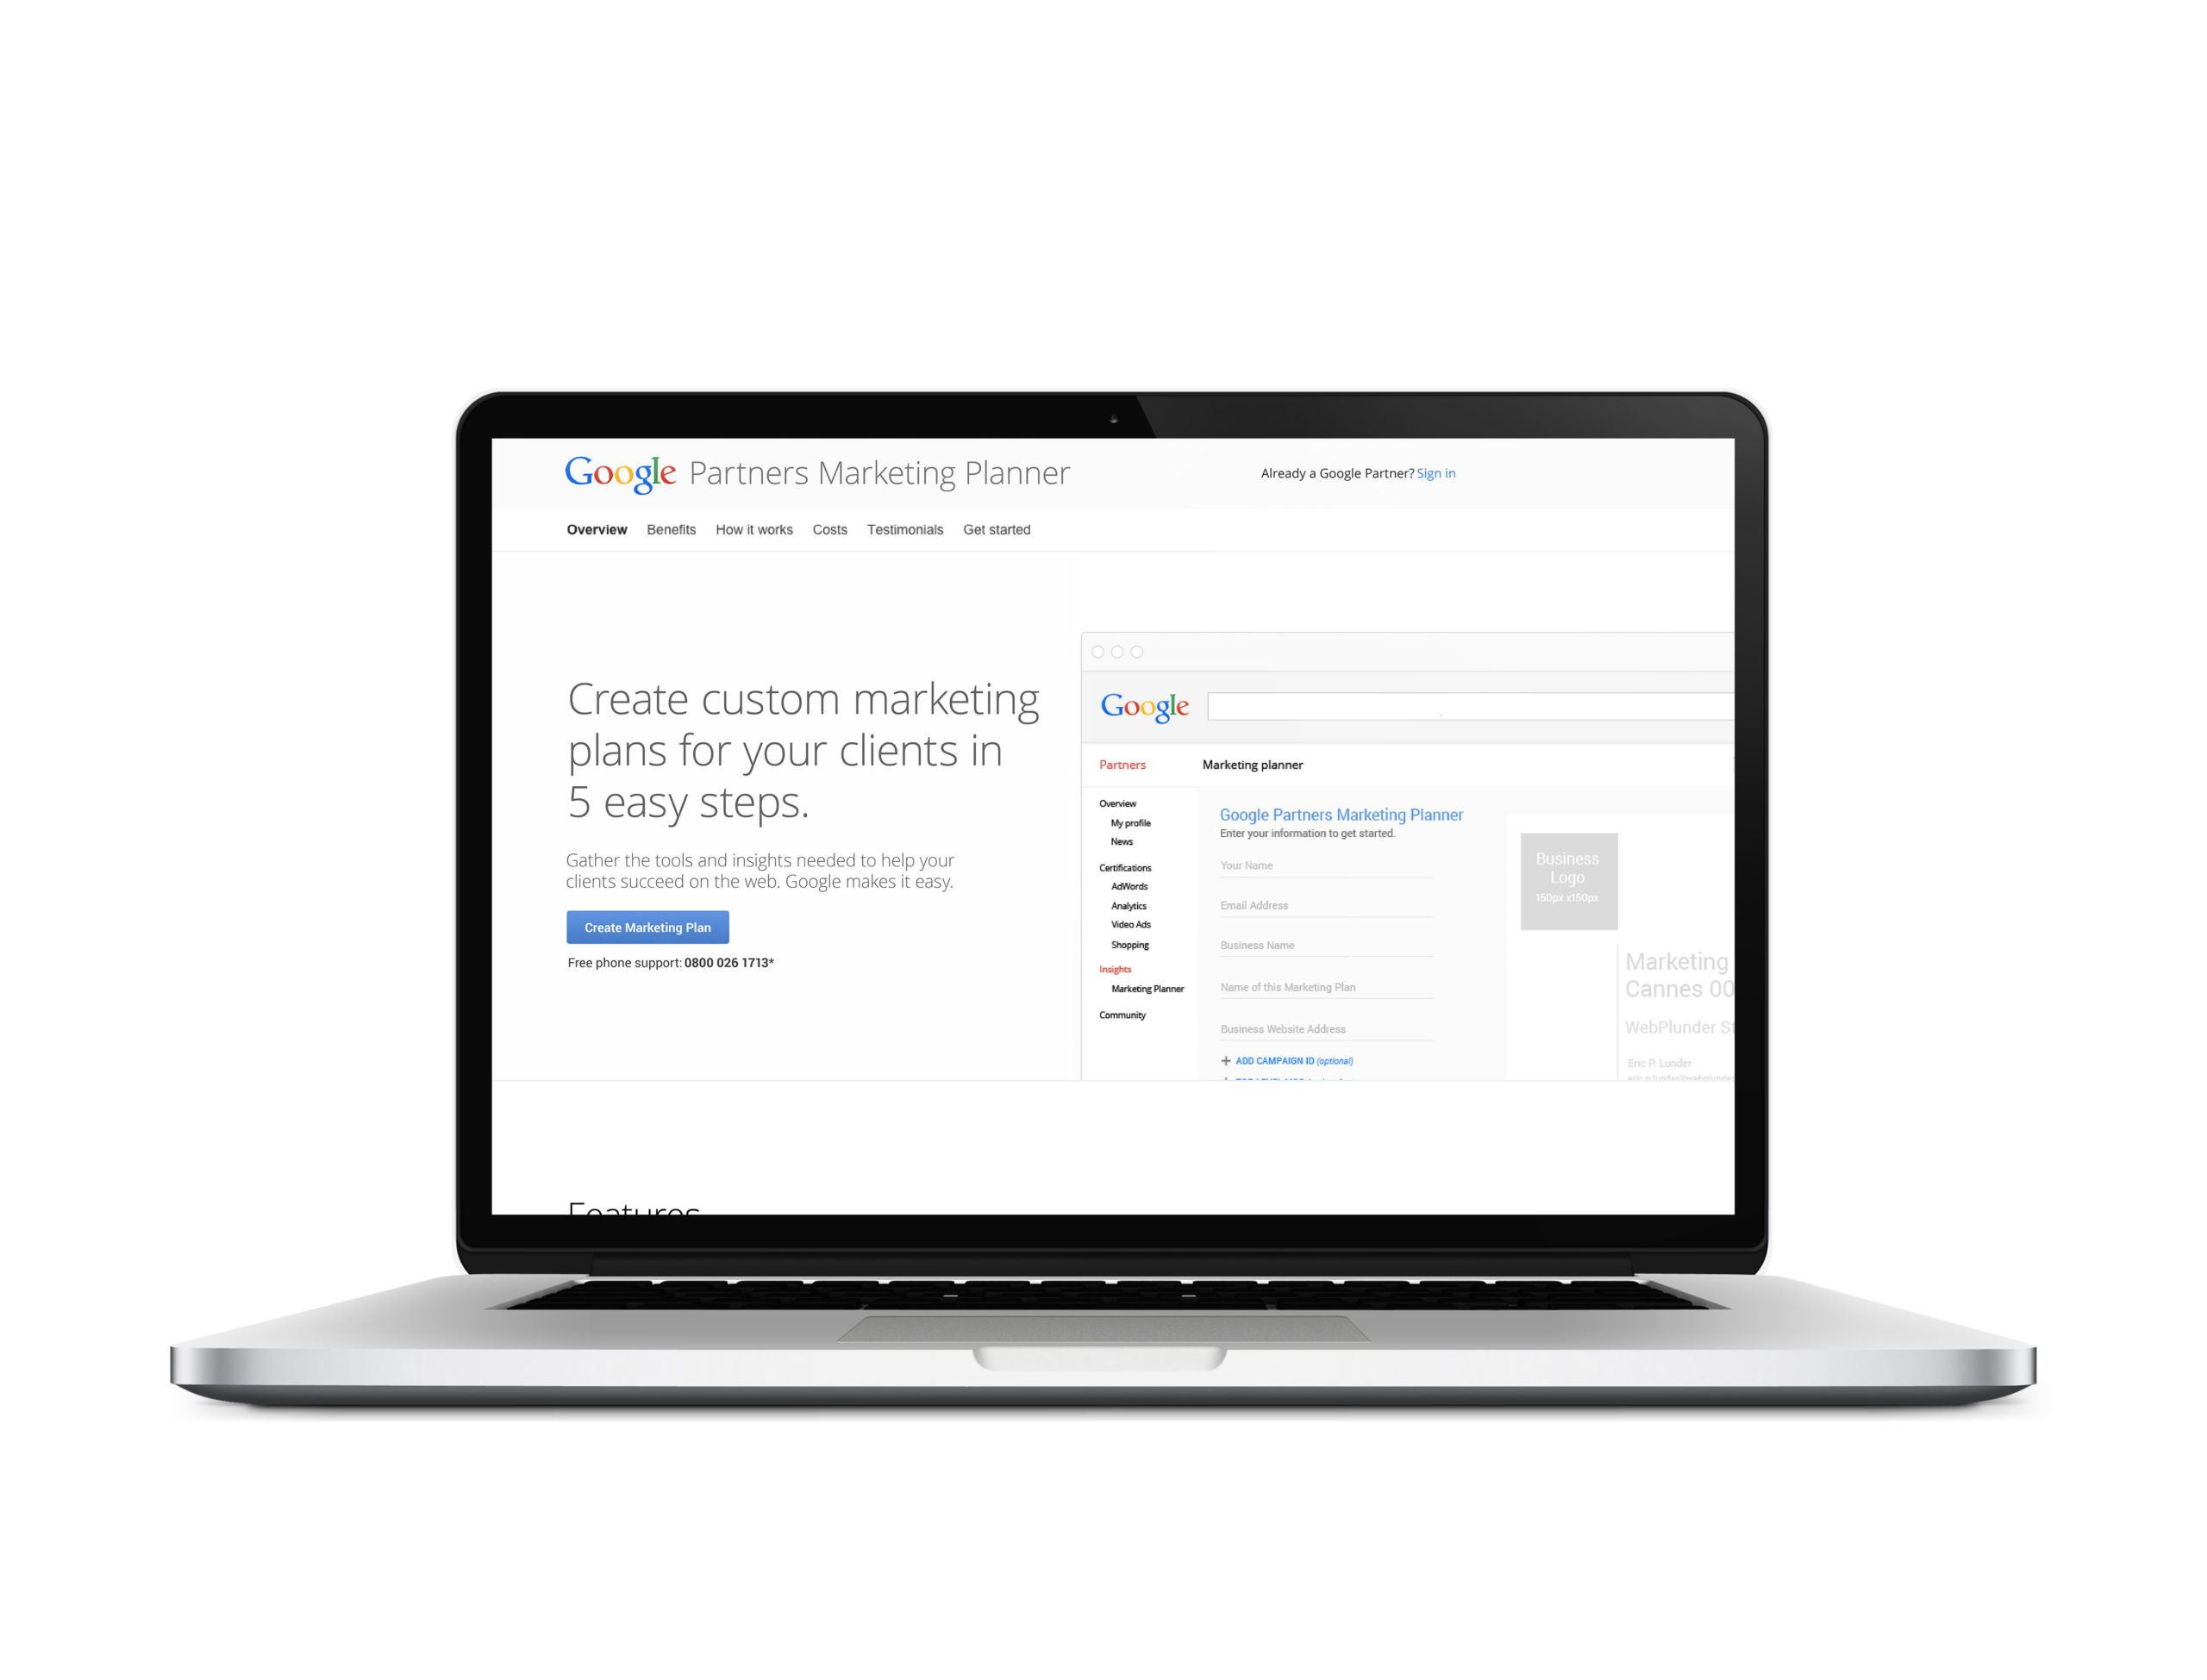 google-marketing-planner-macbook-screen1